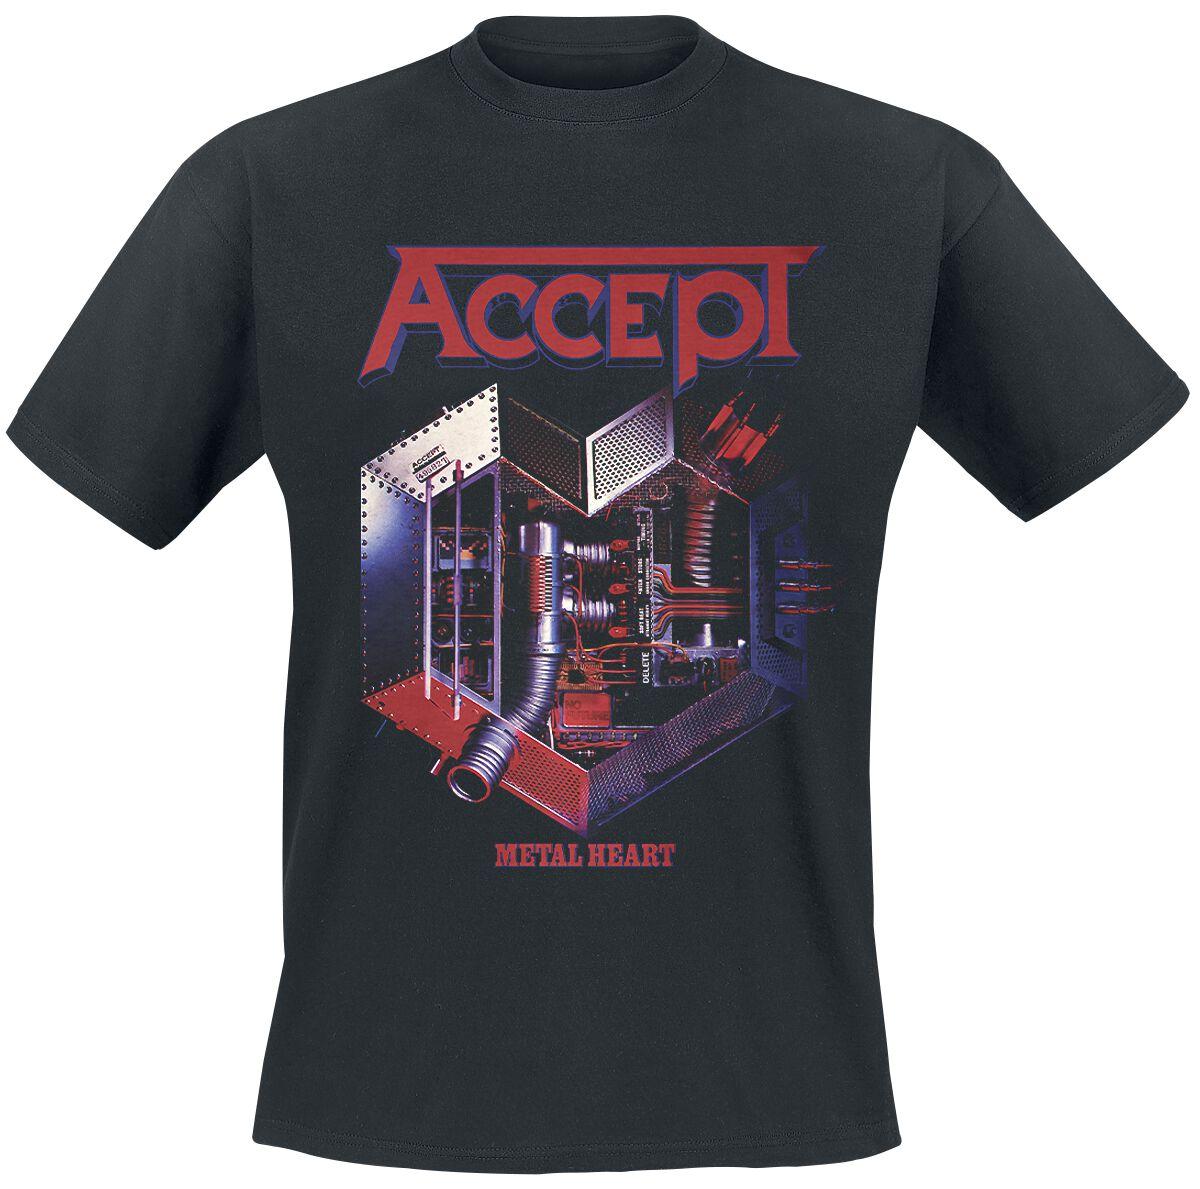 Image of   Accept Metal Heart T-Shirt sort